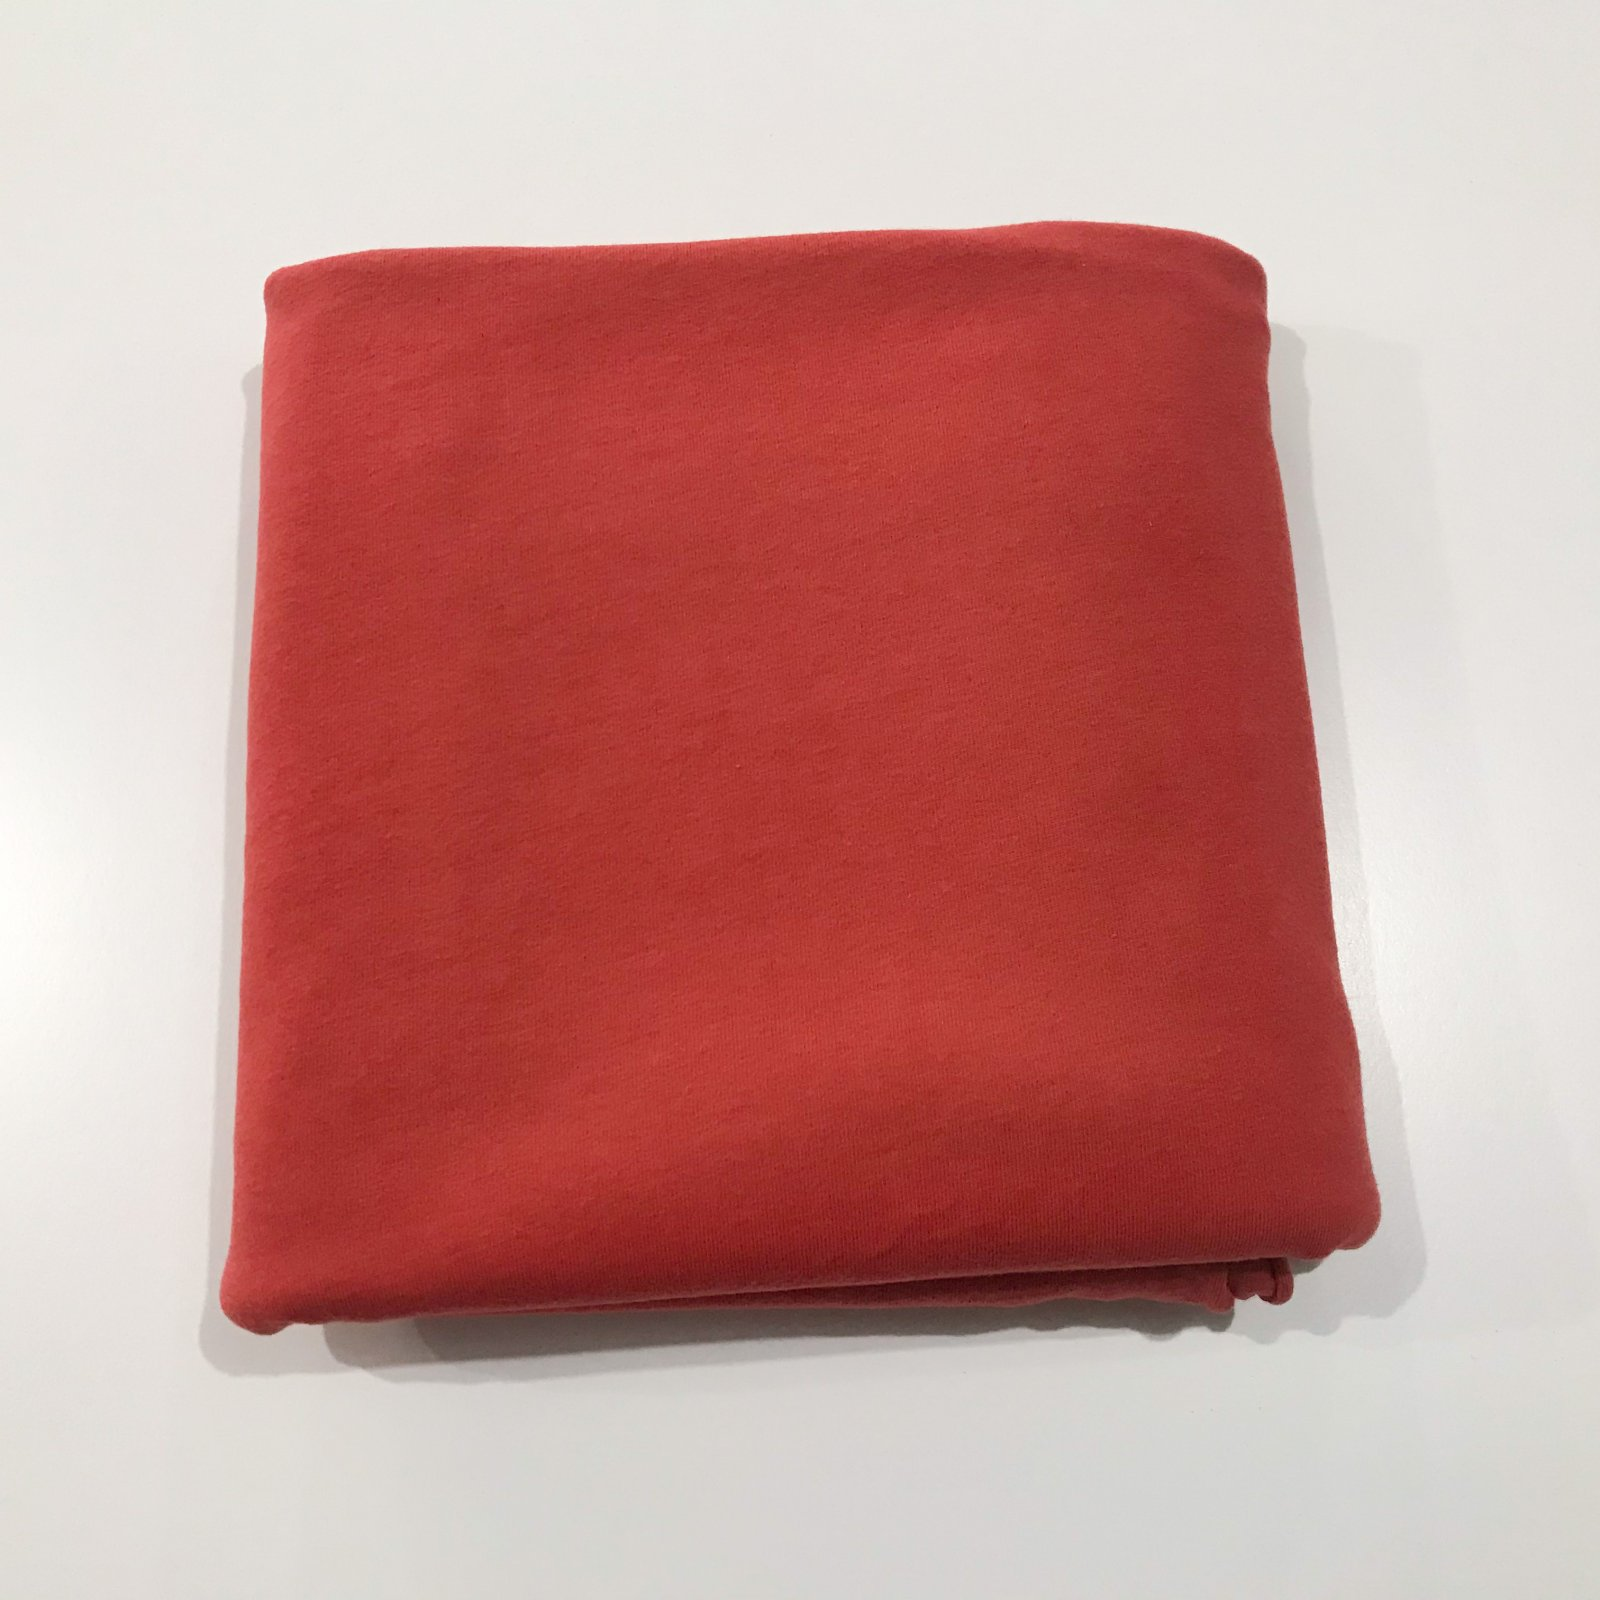 2 yards - Organic Jersey Knit - Rubi Red